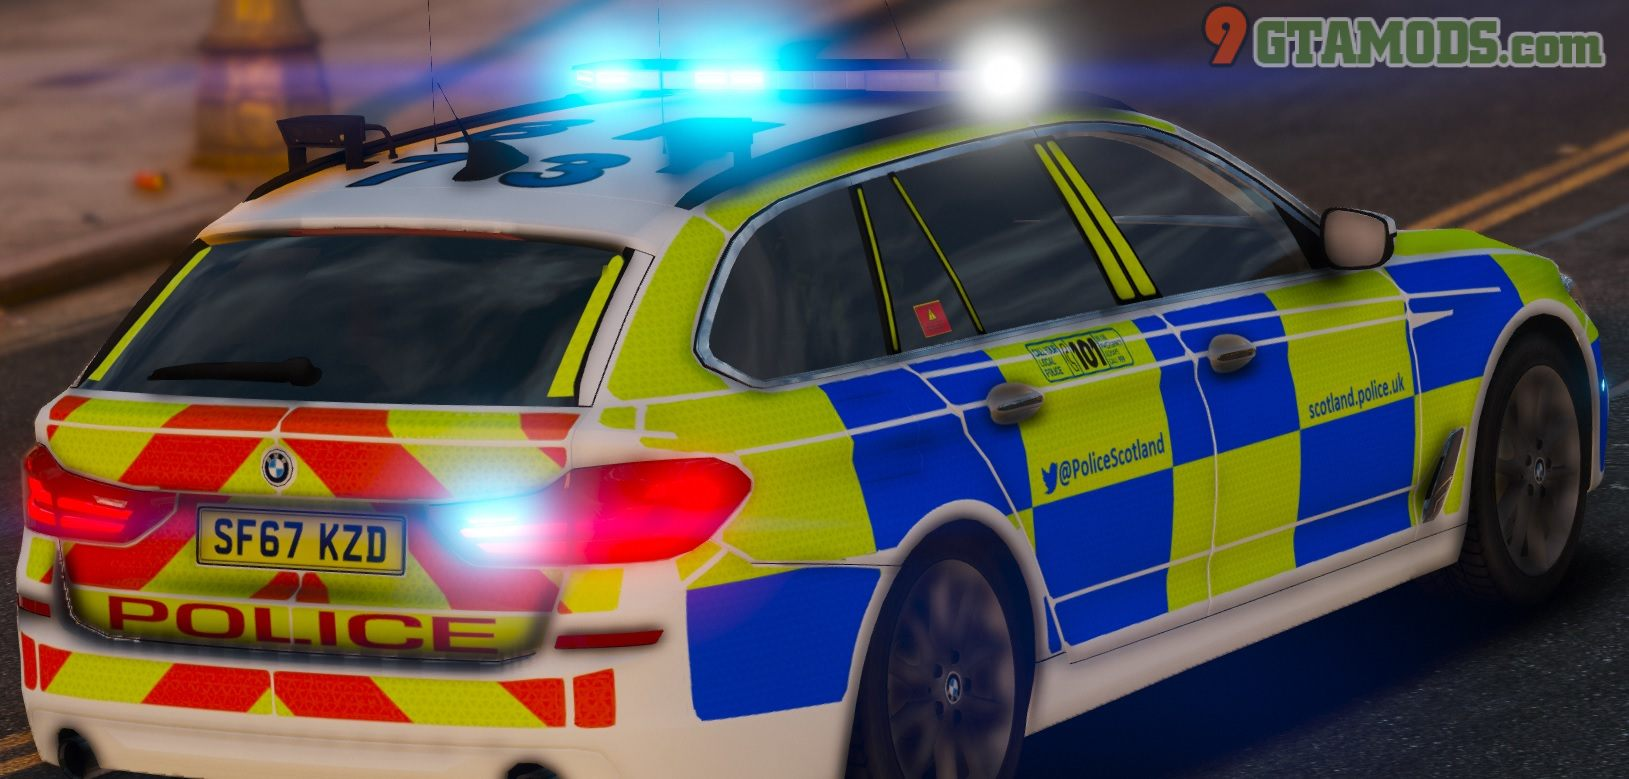 2017 BMW G31 [Scotland Police] V1.1 - 4